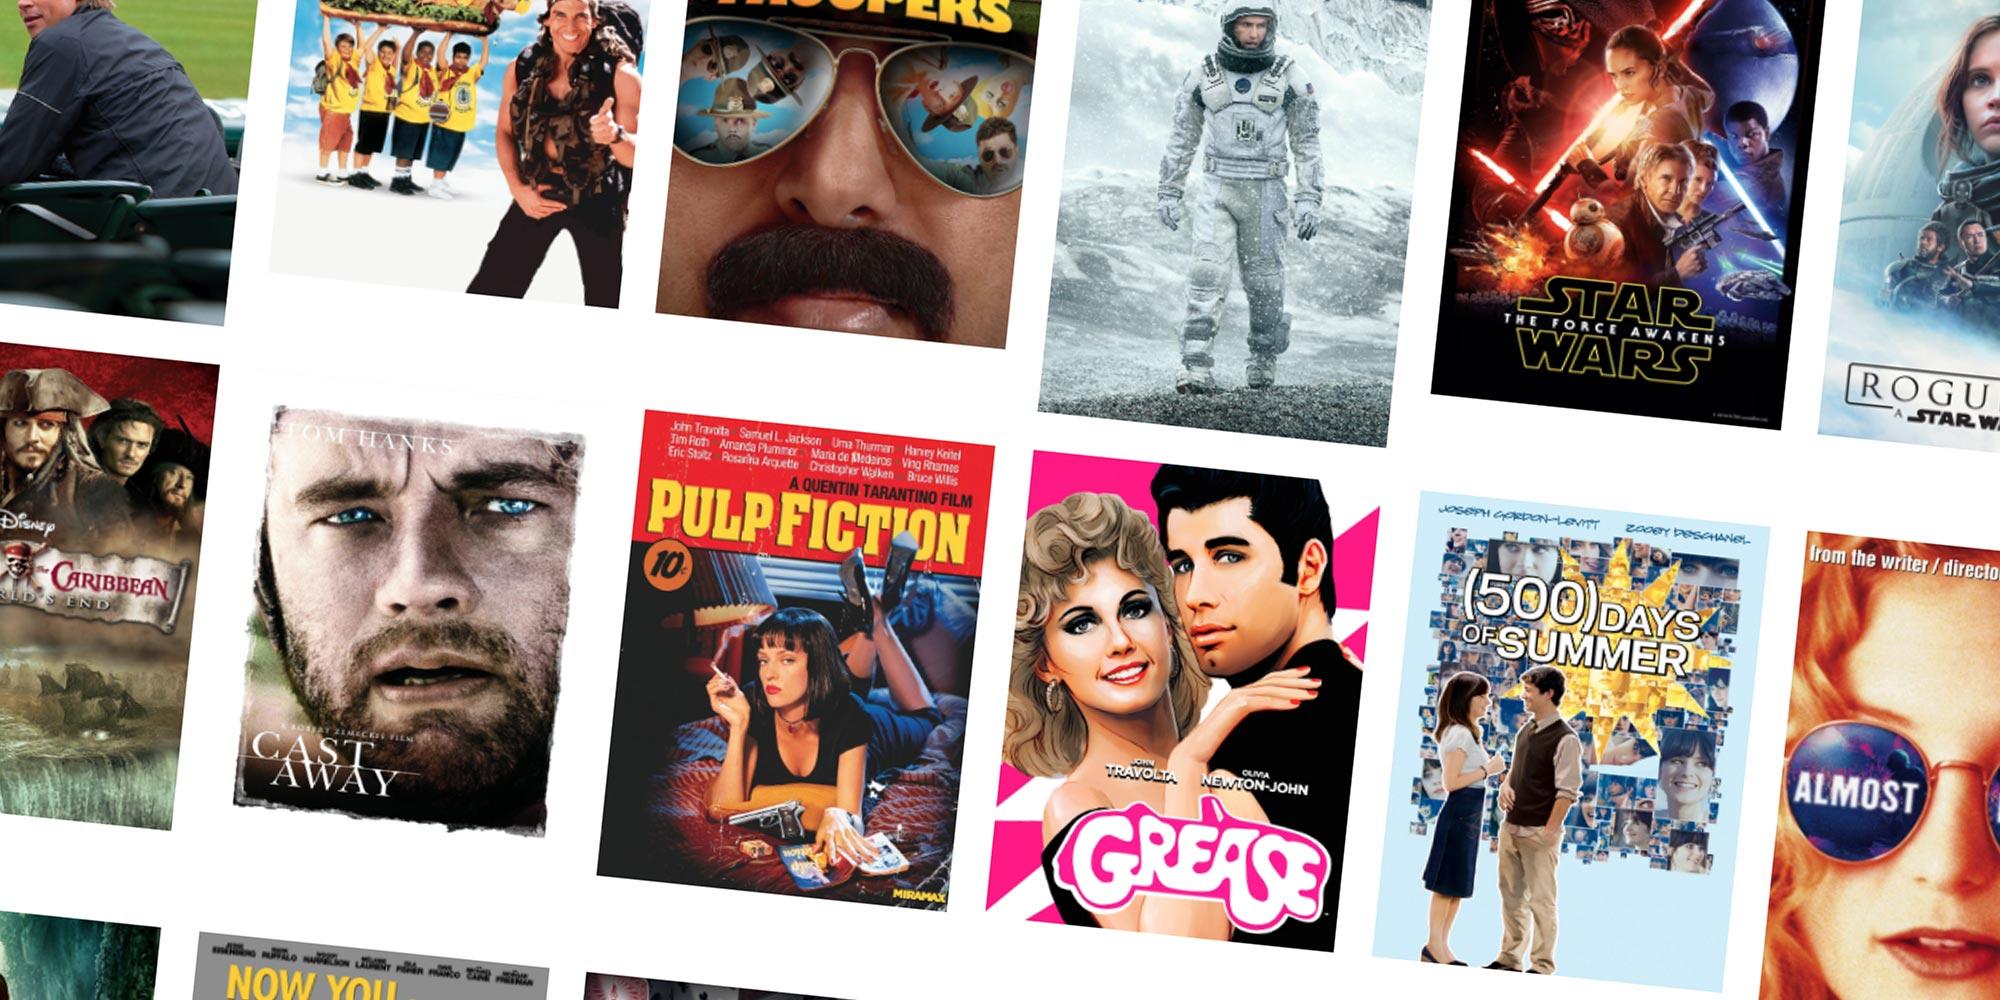 Amazon Digital HD rentals for $1: Top Gun, Star Wars The Force Awakens, more